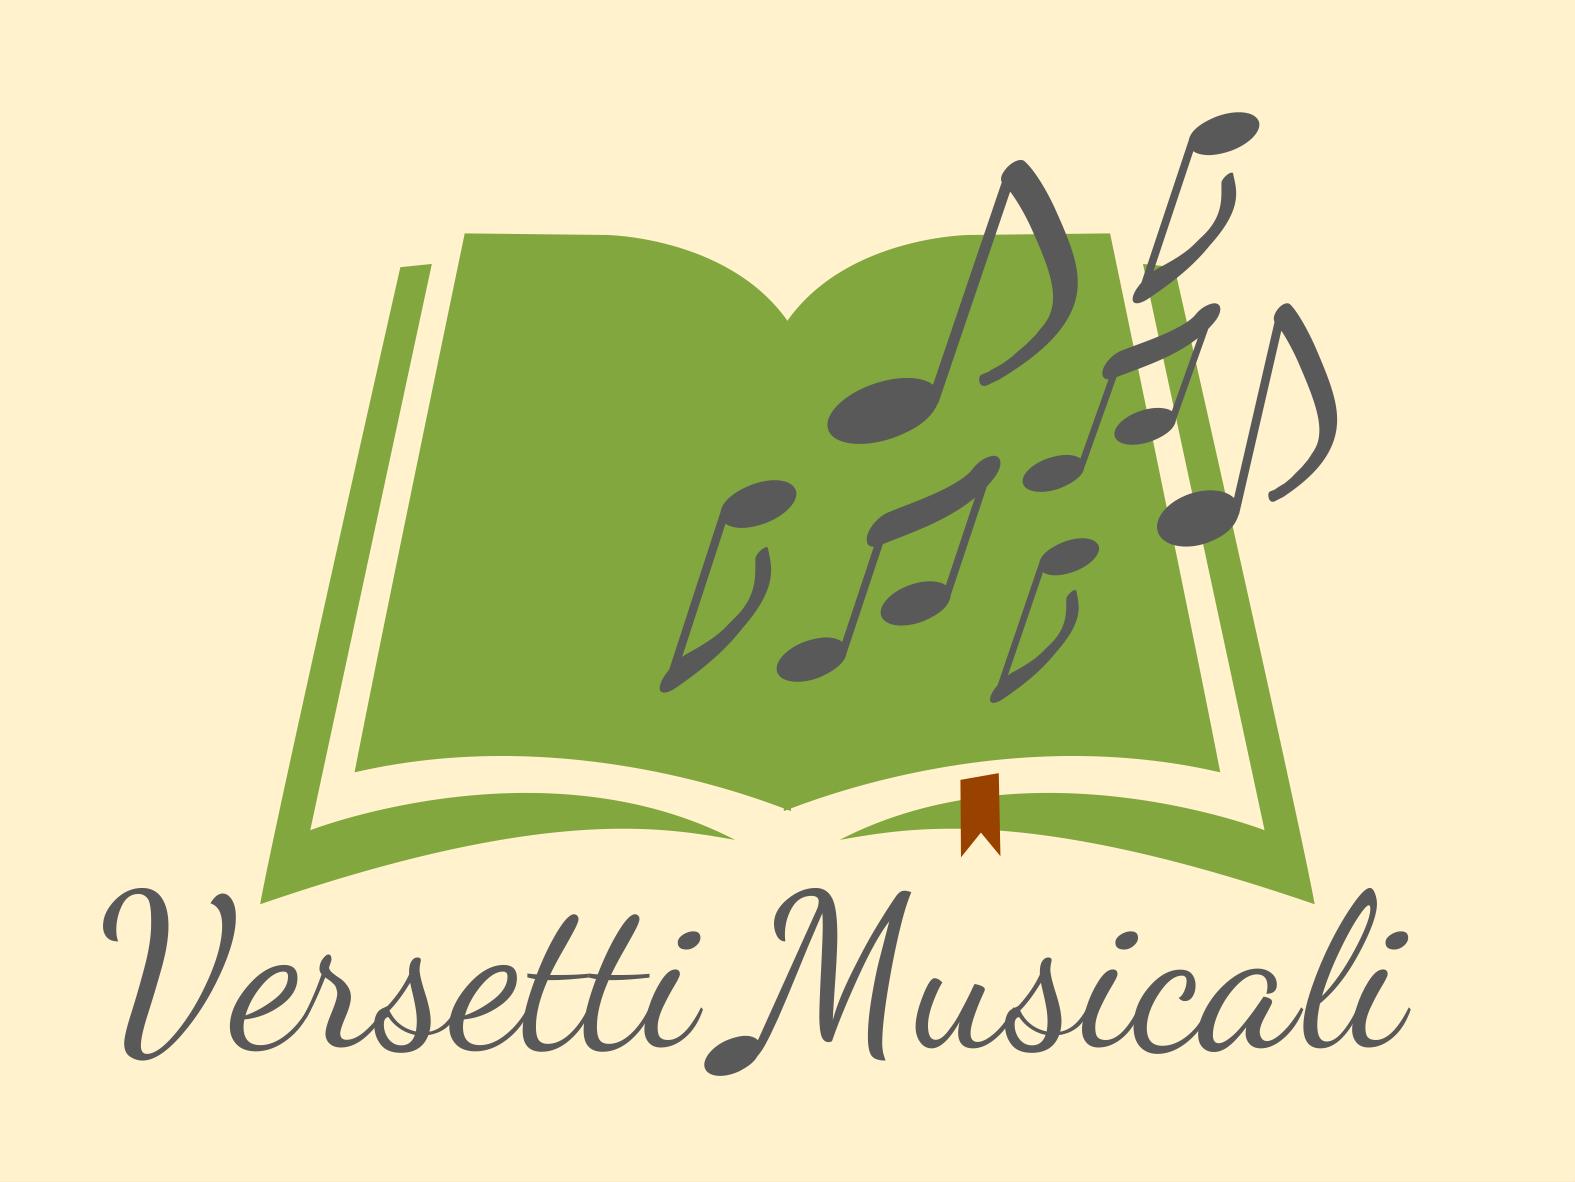 Versetti Musicali - Itália